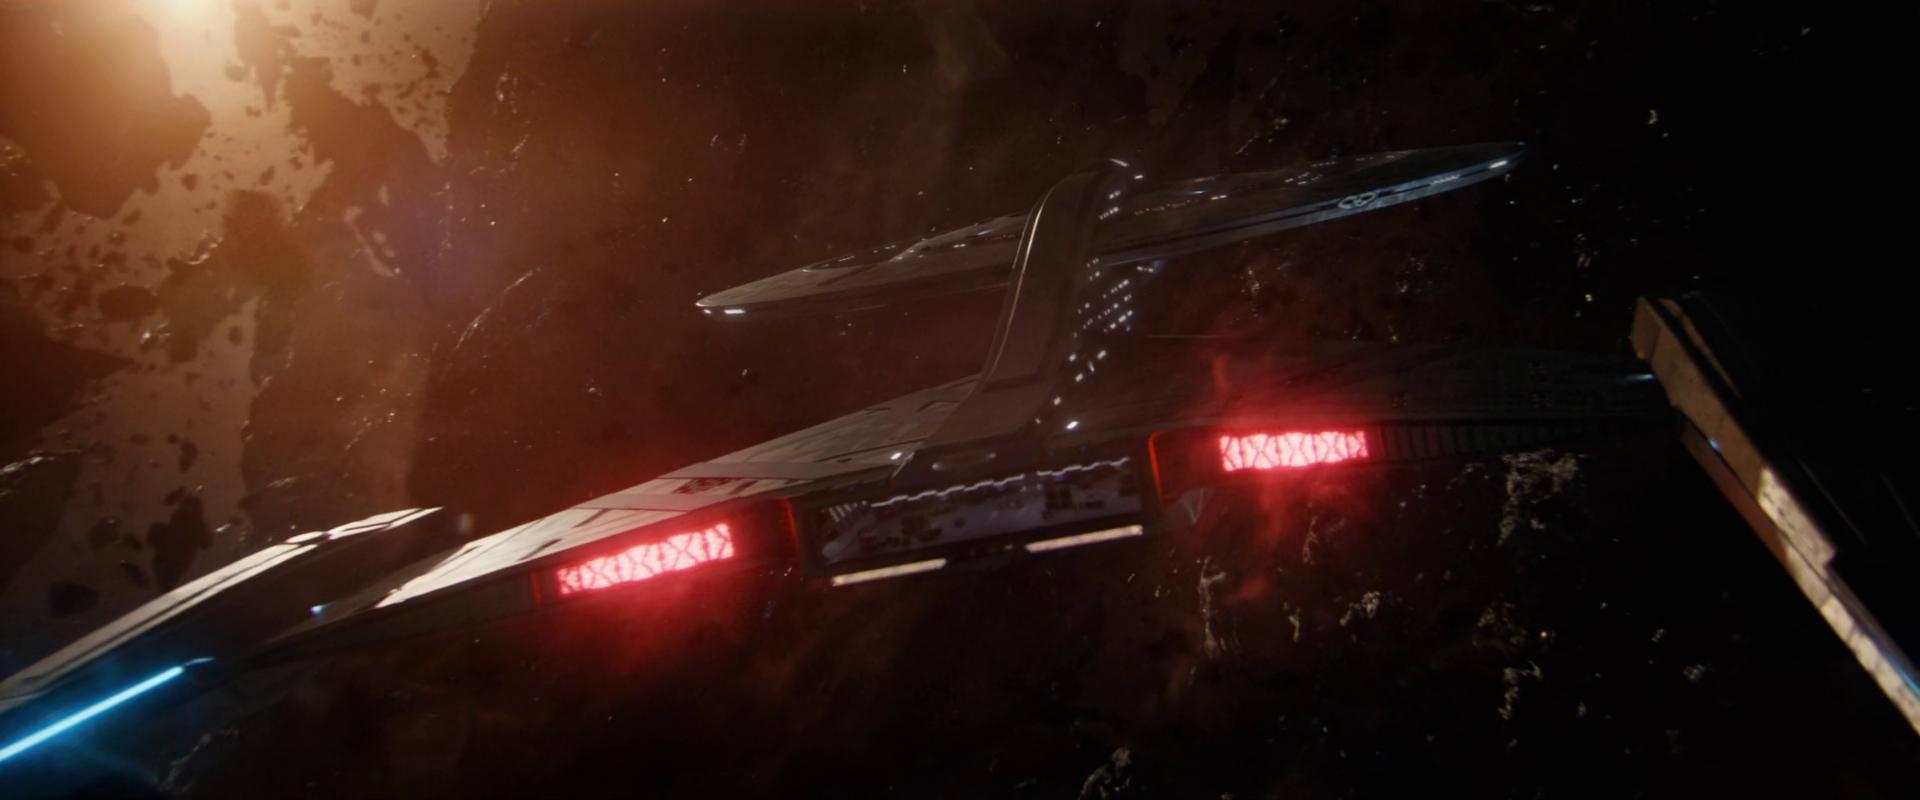 Star Trek Discovery - Stagione 2 (2019) (Completa) WEBRip 1080P HEVC ITA ENG DD5.1 x265 mkv Vlcsnap-2019-01-18-21lyk2e